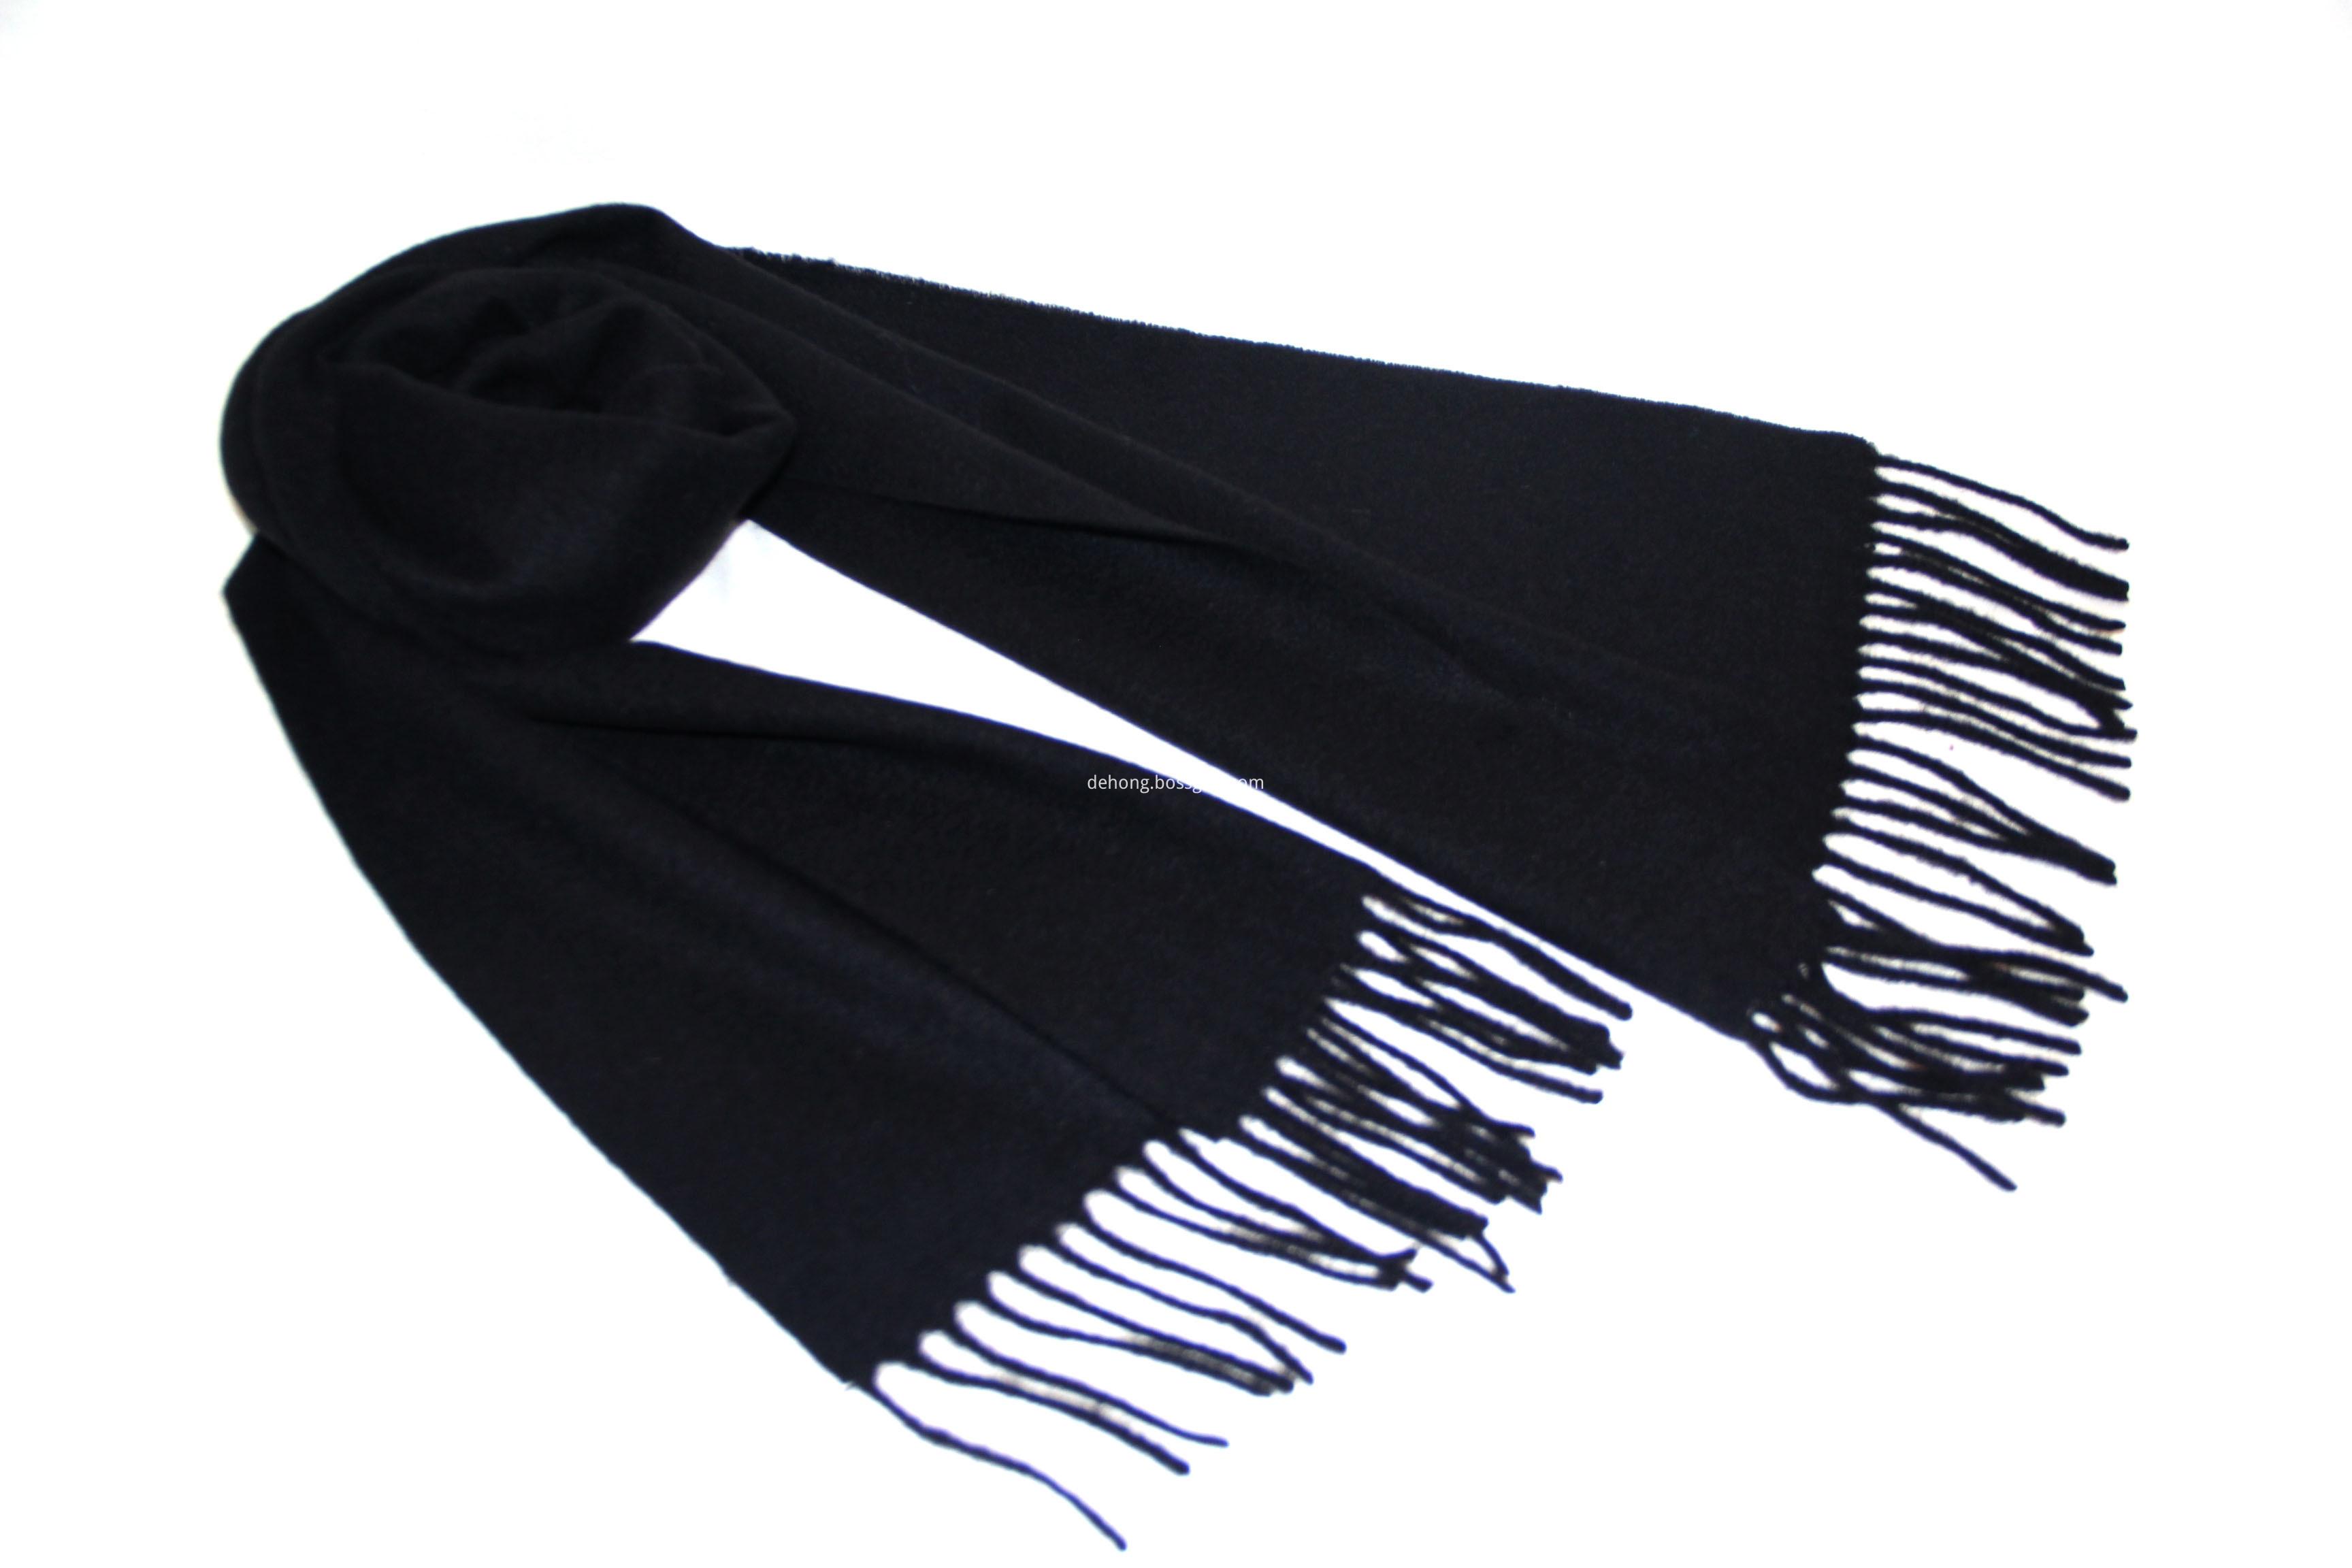 Black Cashmere Scarf